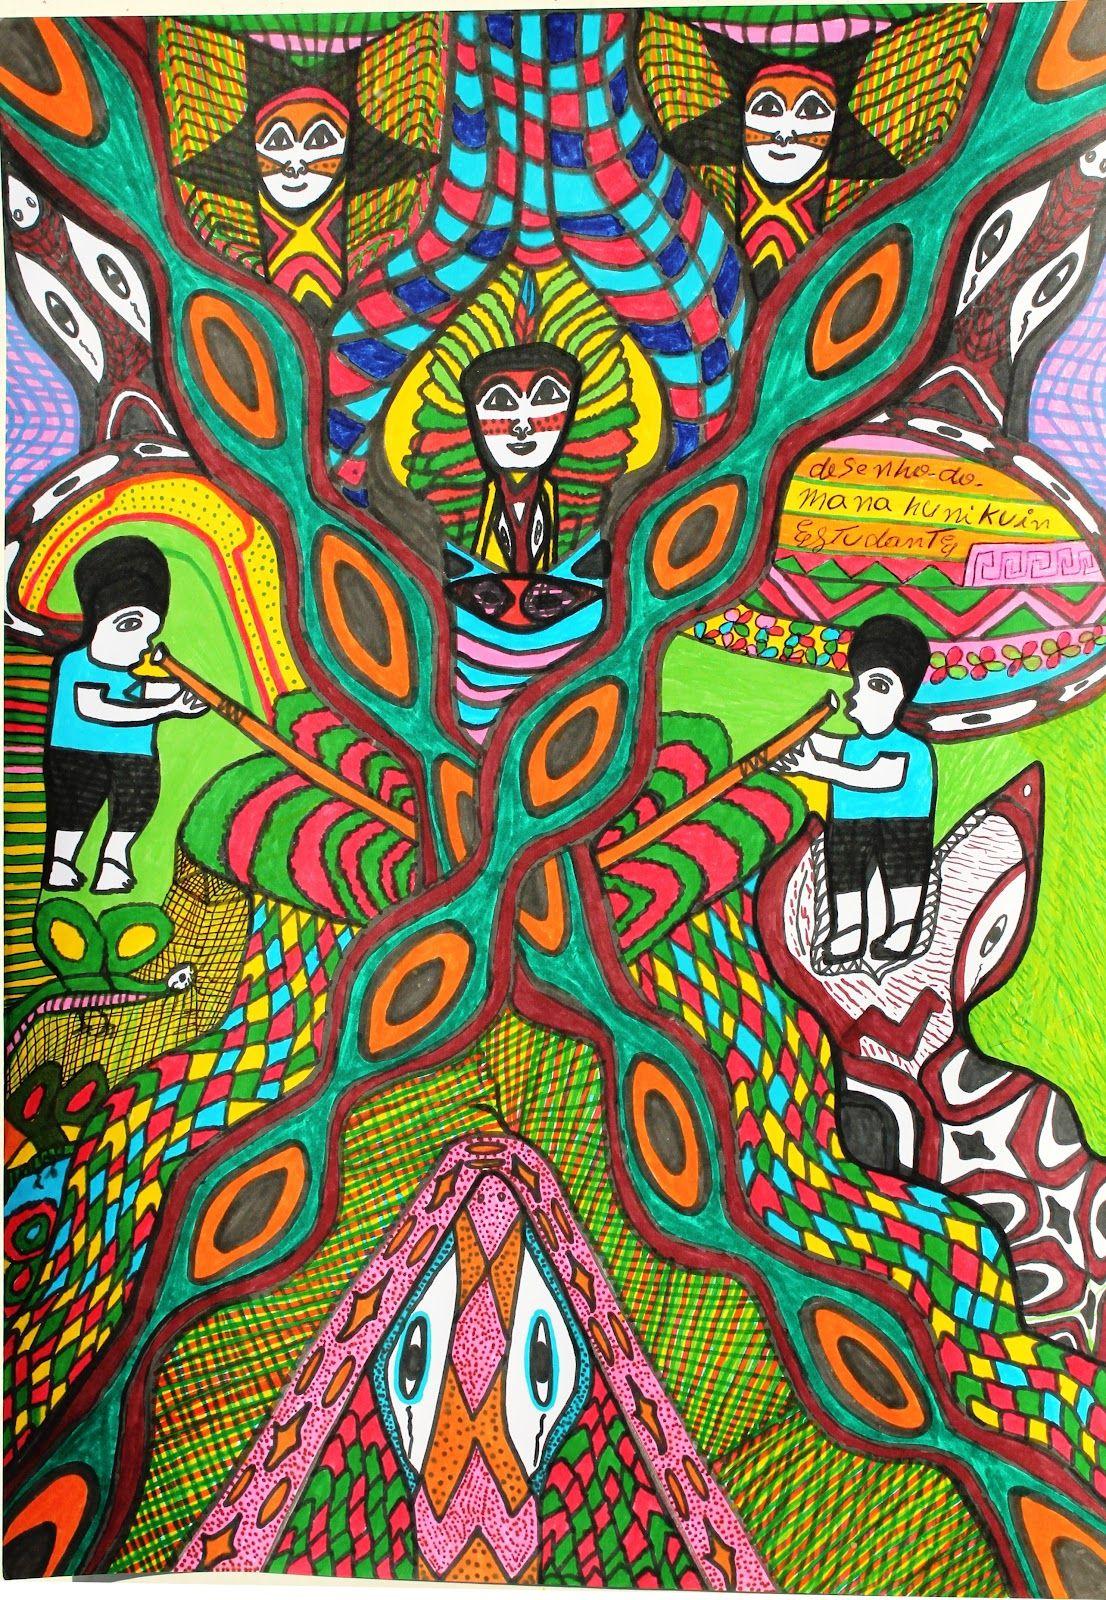 Armario Definicion En Ingles ~ Mana Huni Kuin, 2012 Huni Kuin Pinterest Brasil e Arte